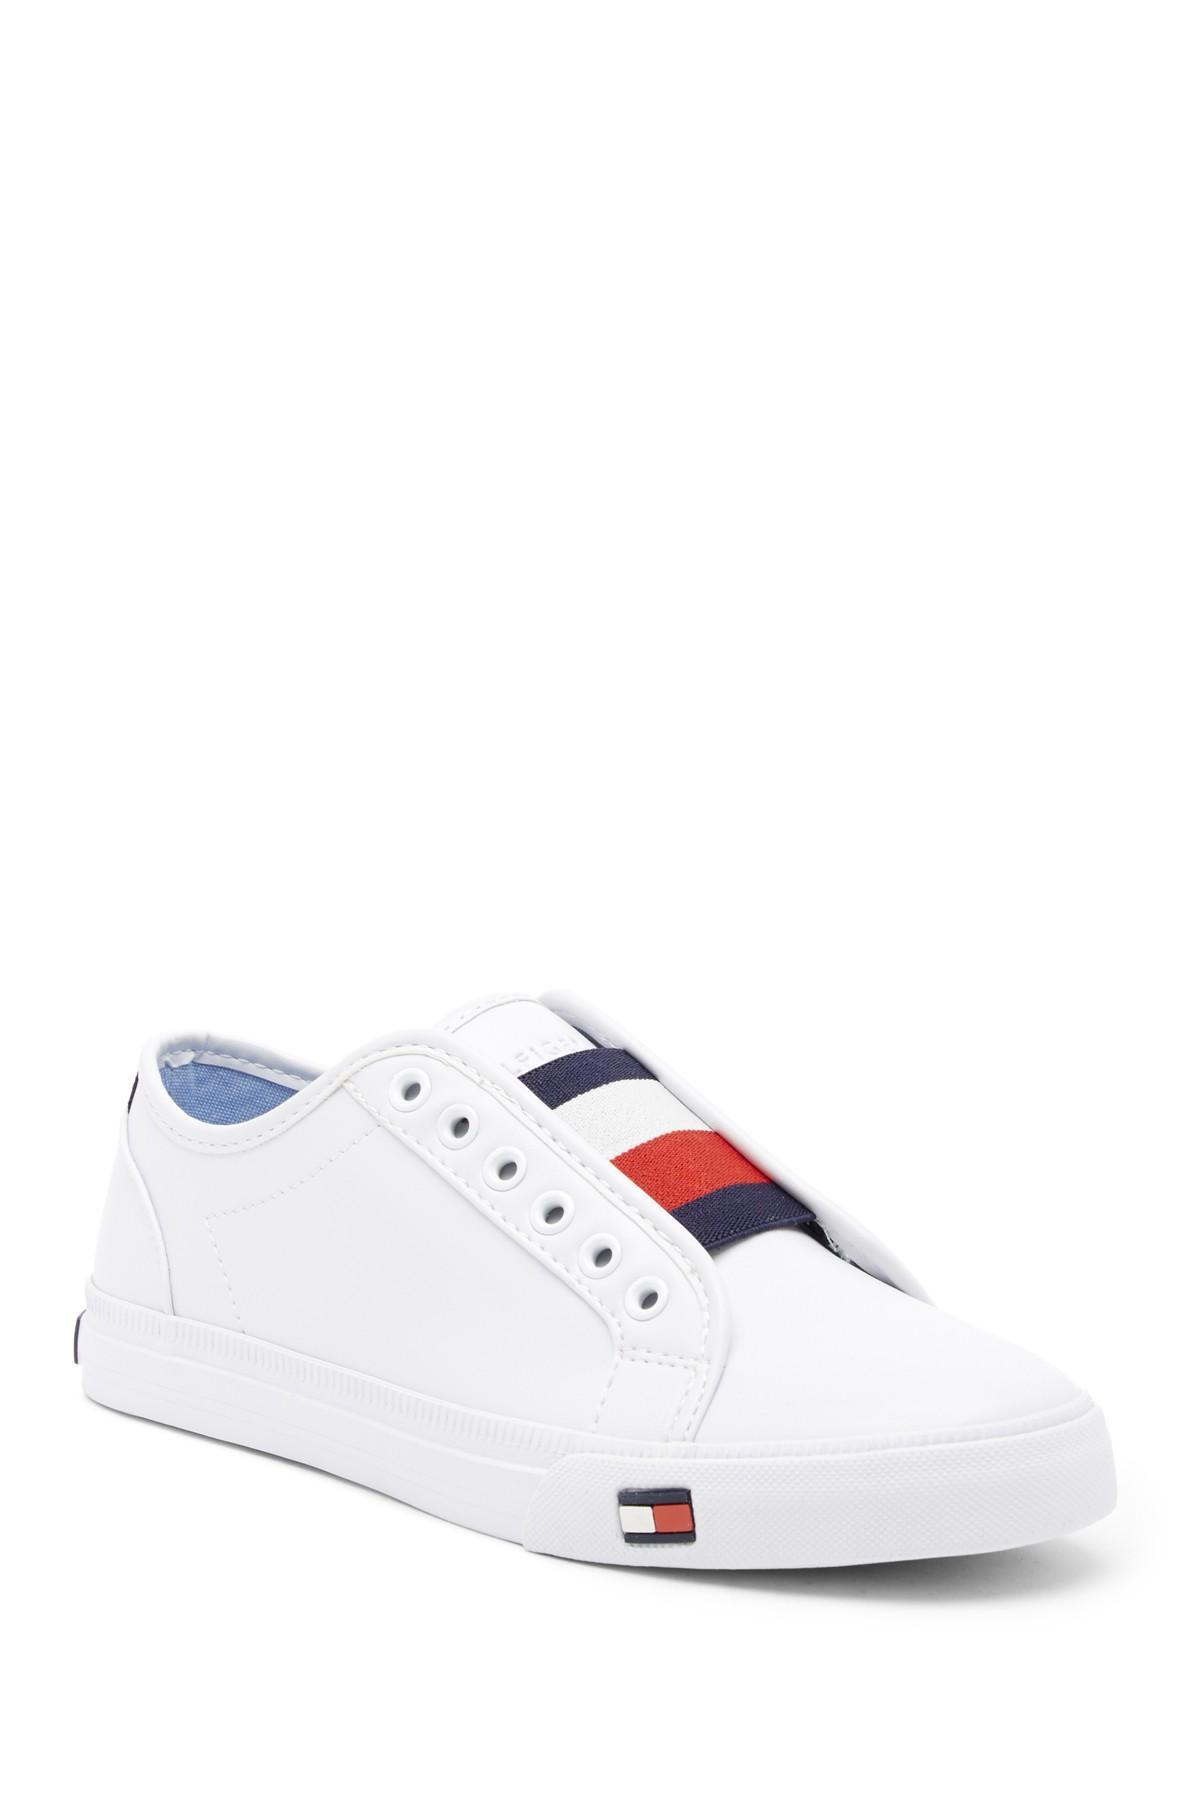 50e838f2f4d5b Tommy Hilfiger. Women s Anni Slip-on Sneaker